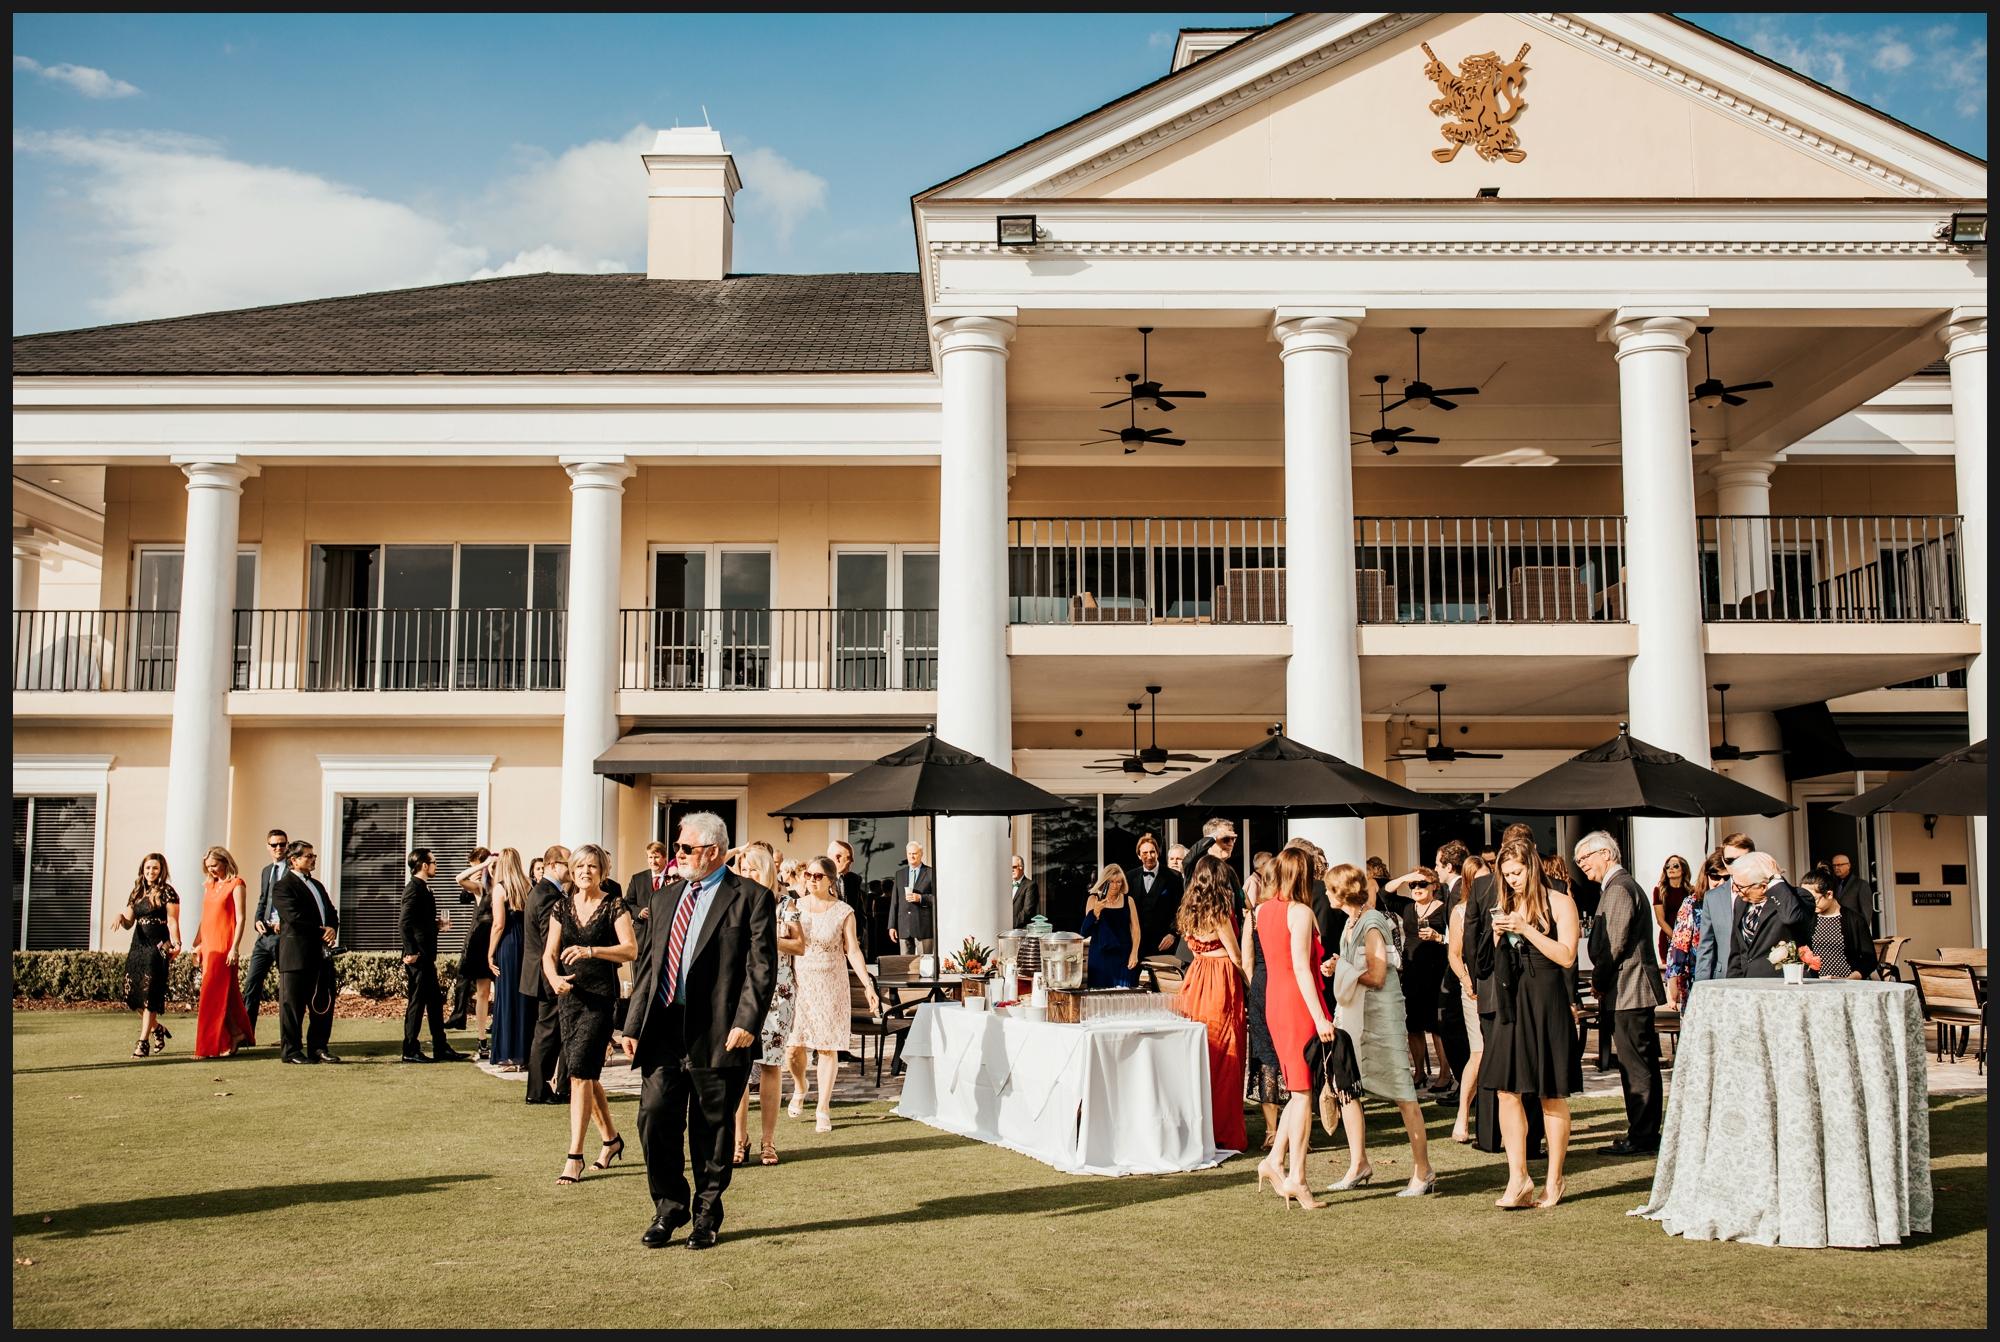 Orlando-Wedding-Photographer-destination-wedding-photographer-florida-wedding-photographer-hawaii-wedding-photographer_0217.jpg